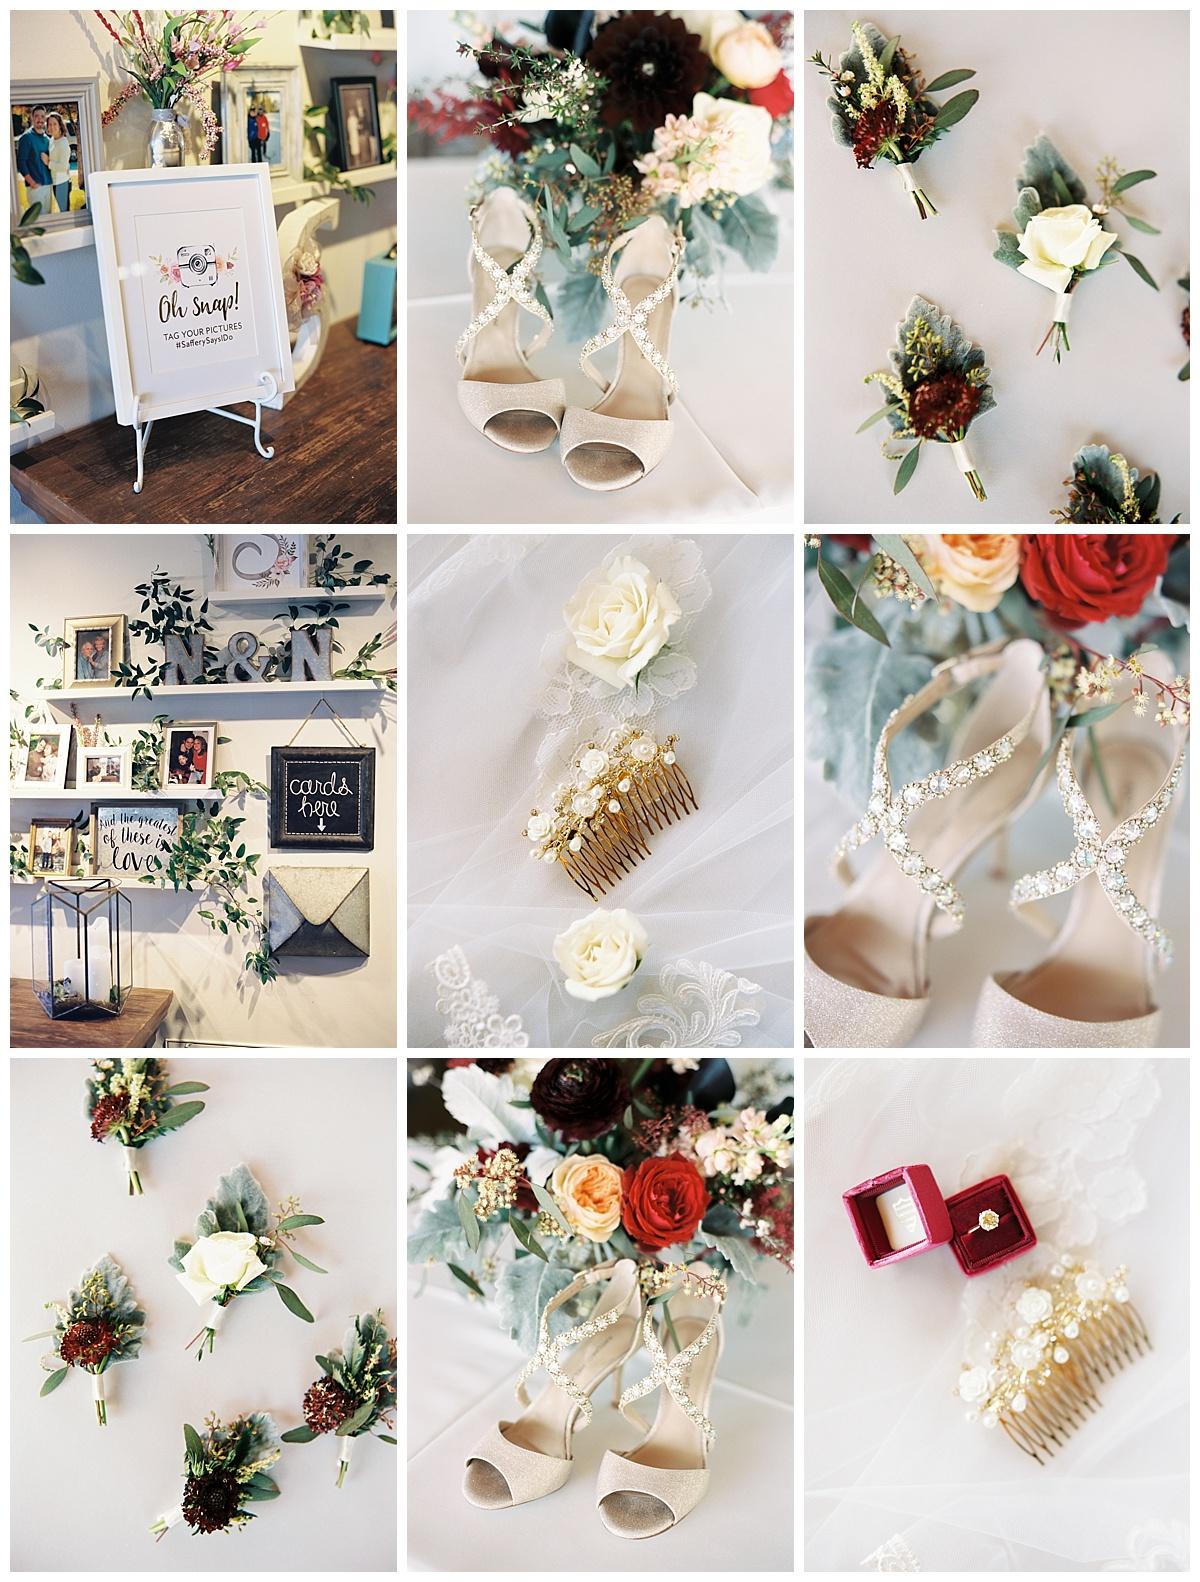 hickory-stree-annex-wedding-ar-photography-nicole-nolan-1.jpg